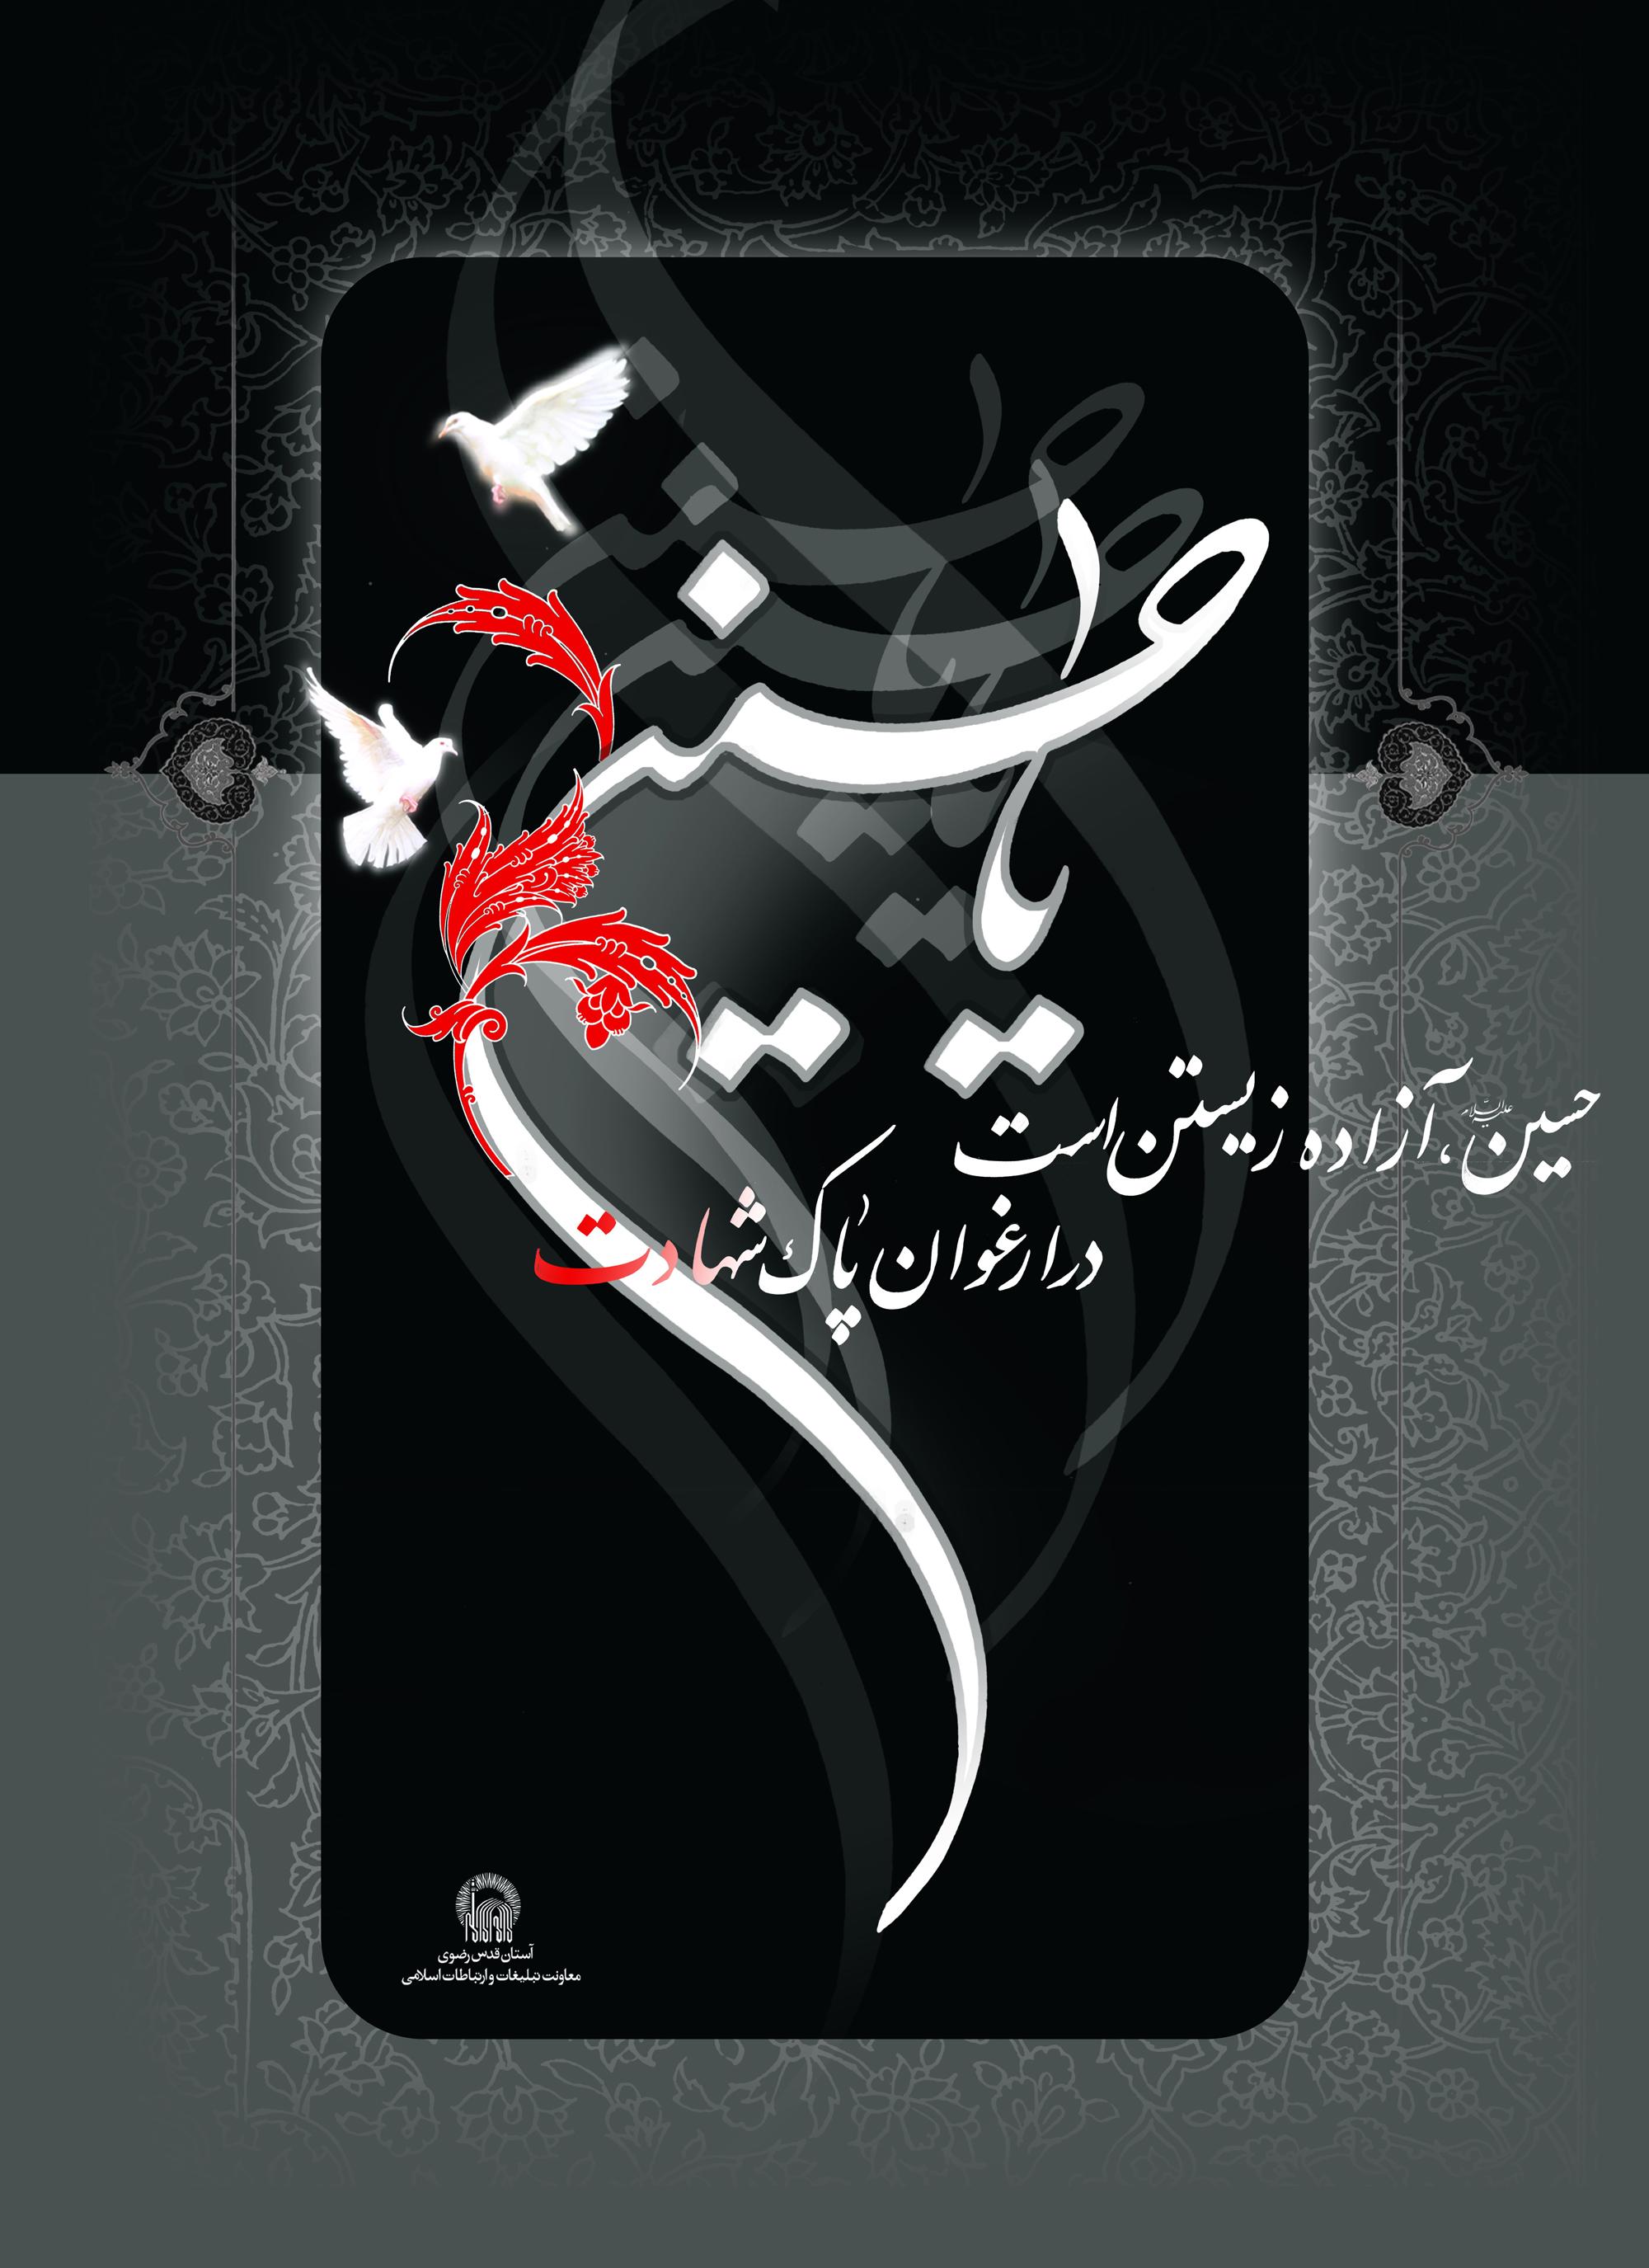 ۰۰۸_ImamHussein_www.IslamicWallpaper.ir_2